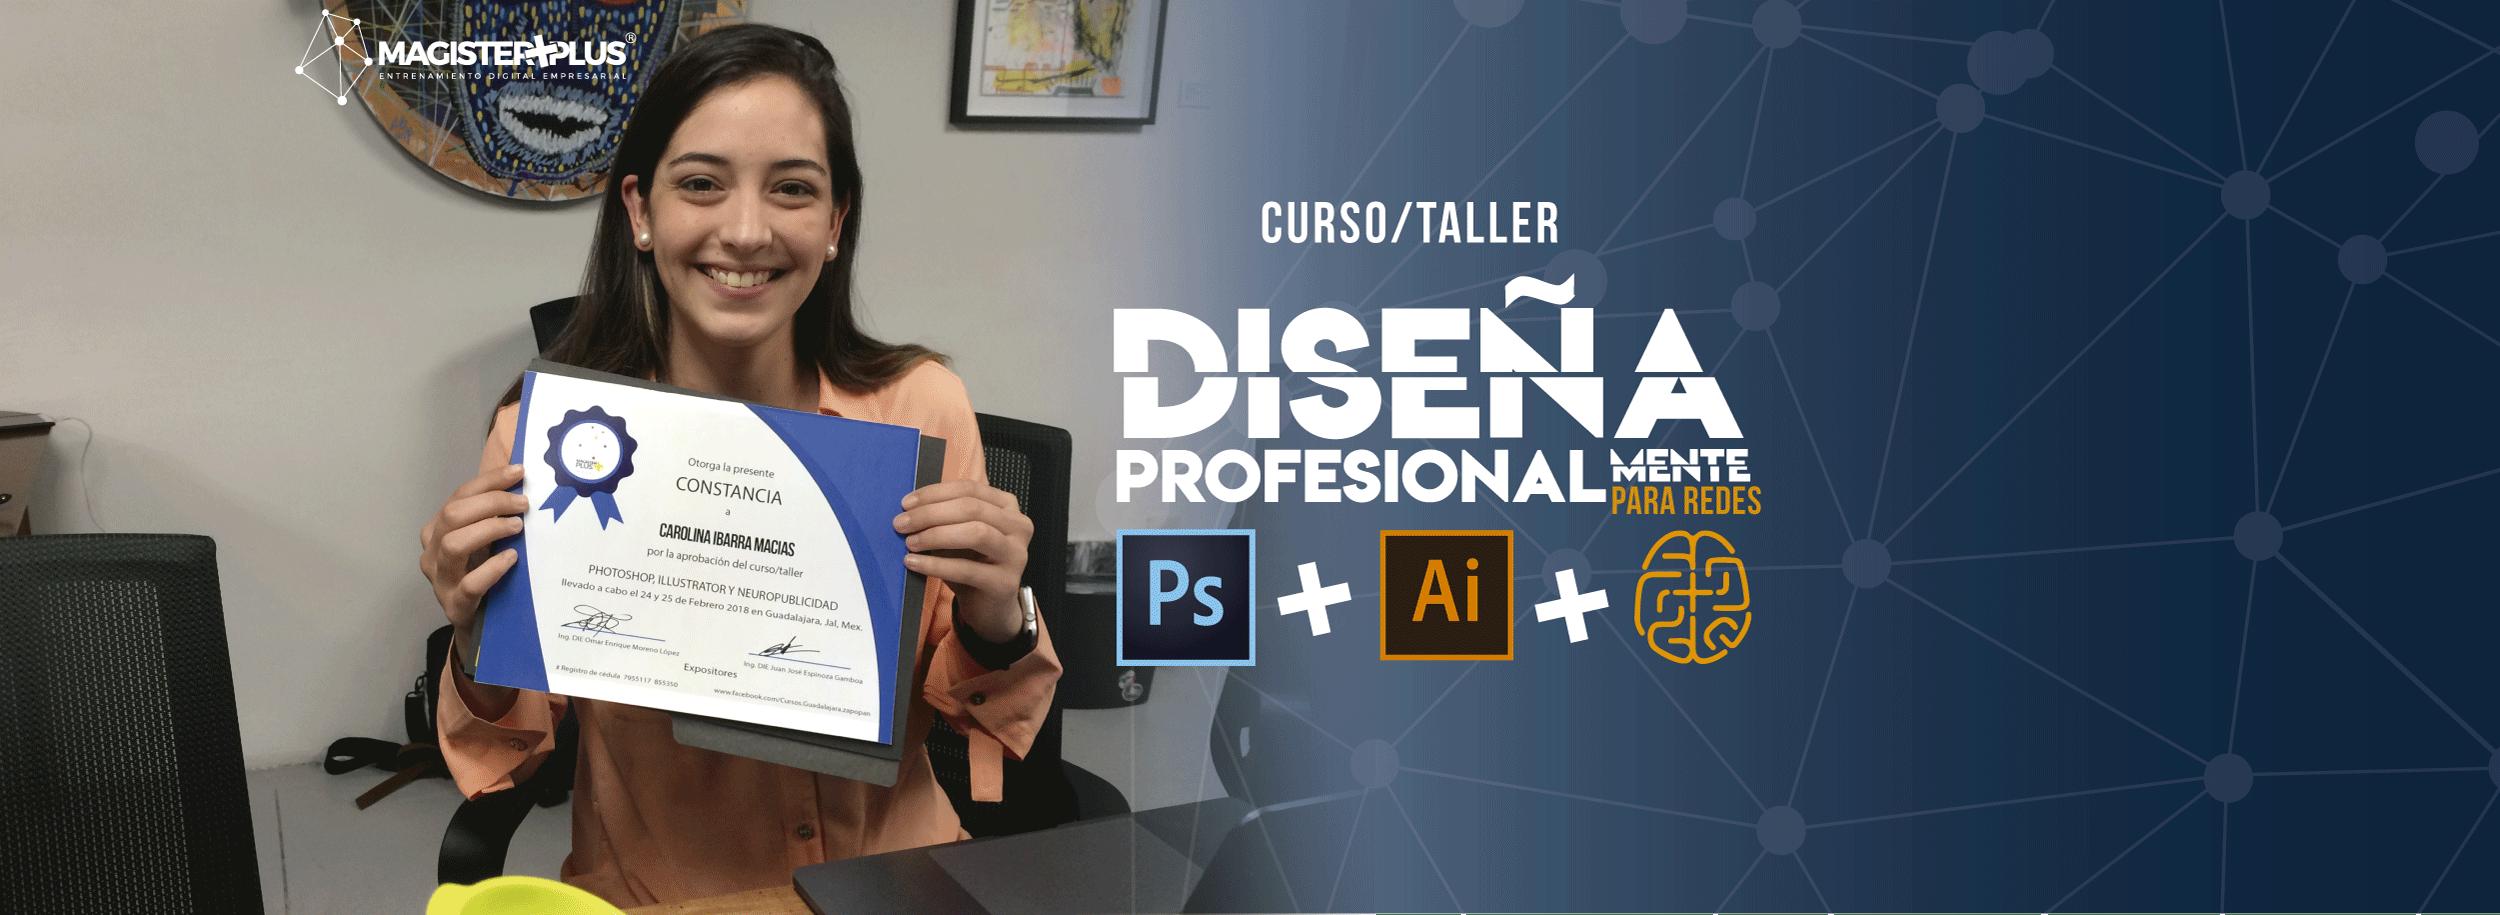 Diplomado Photoshop, Illustrator y Neuropubli